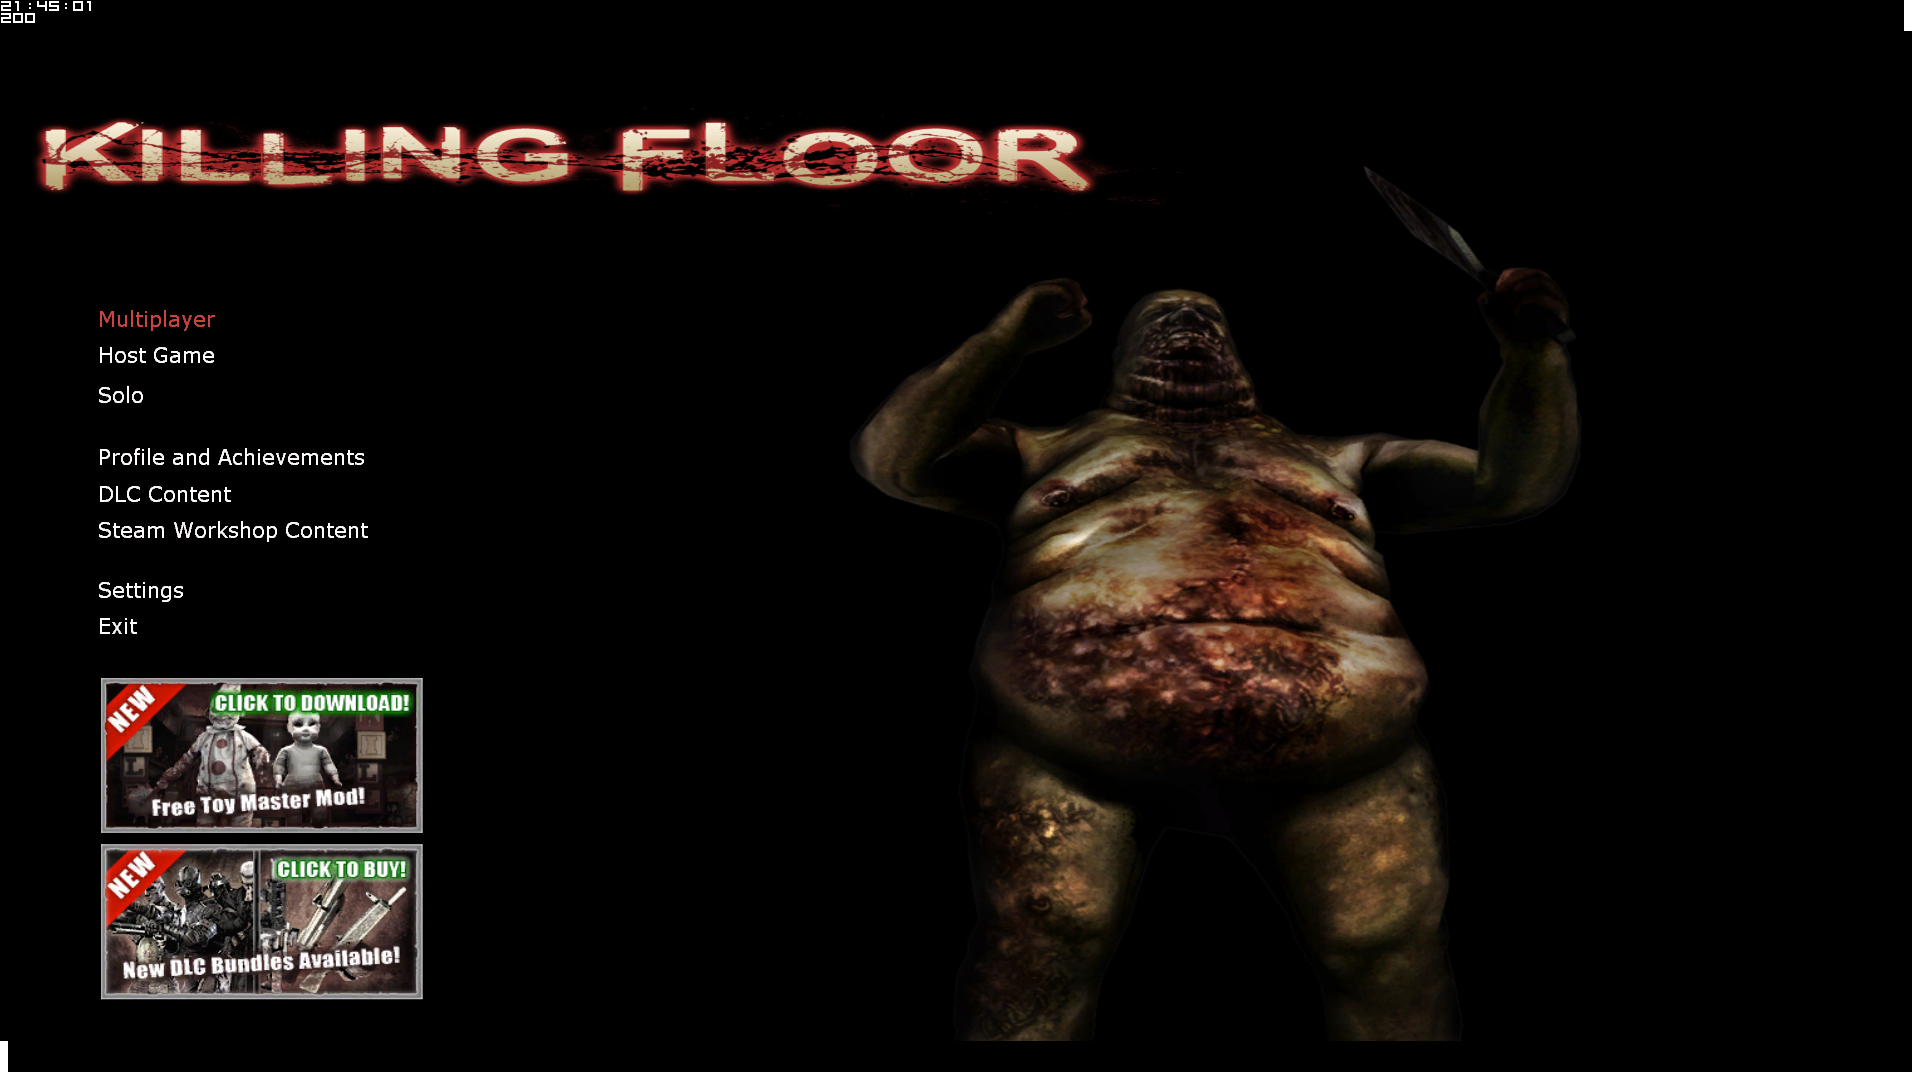 killing floor steam workshop not downloading